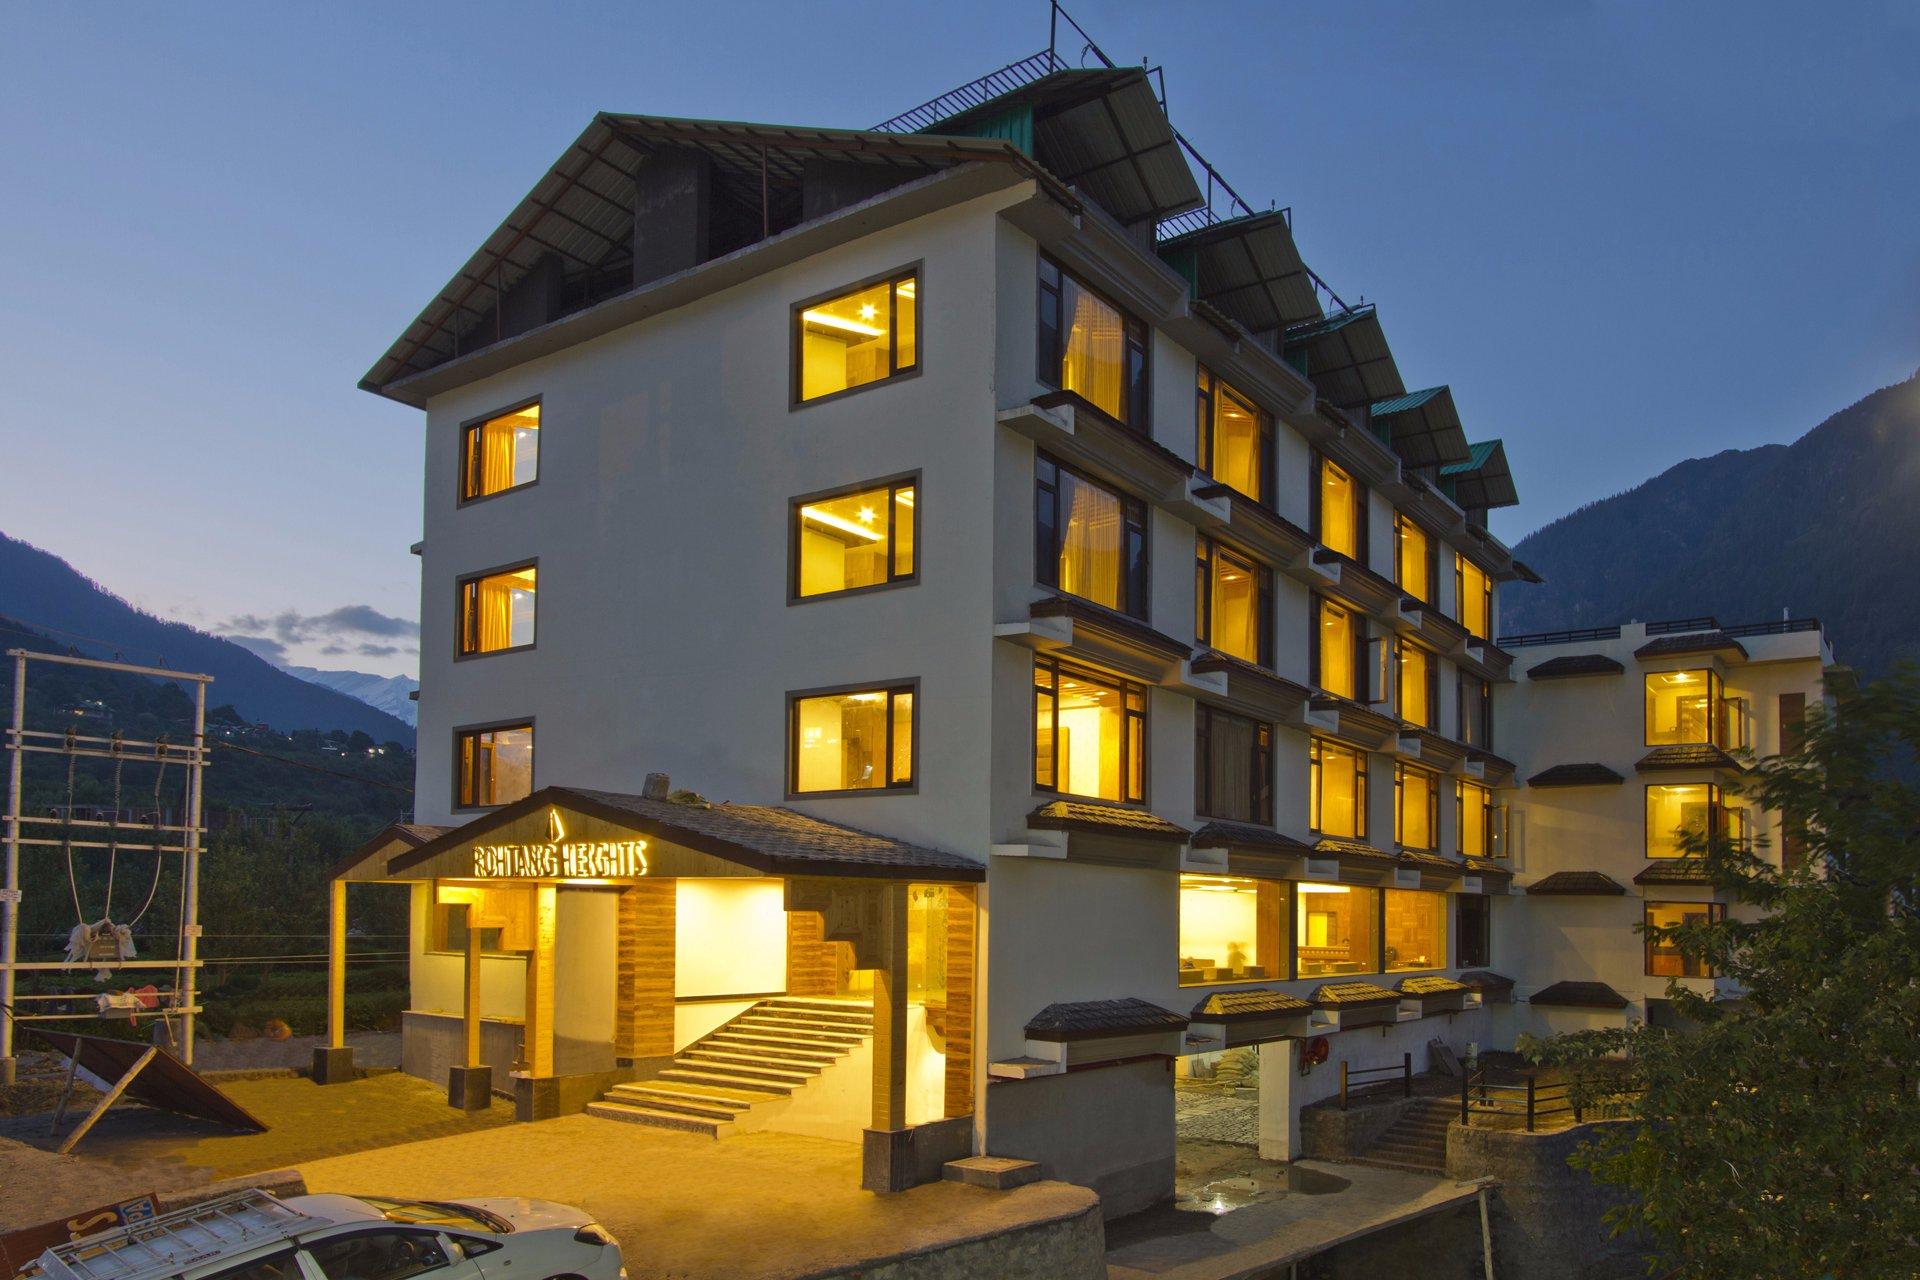 Rohtang Heights Resorts And Spa Prices Hotel Reviews Rangri India Tripadvisor